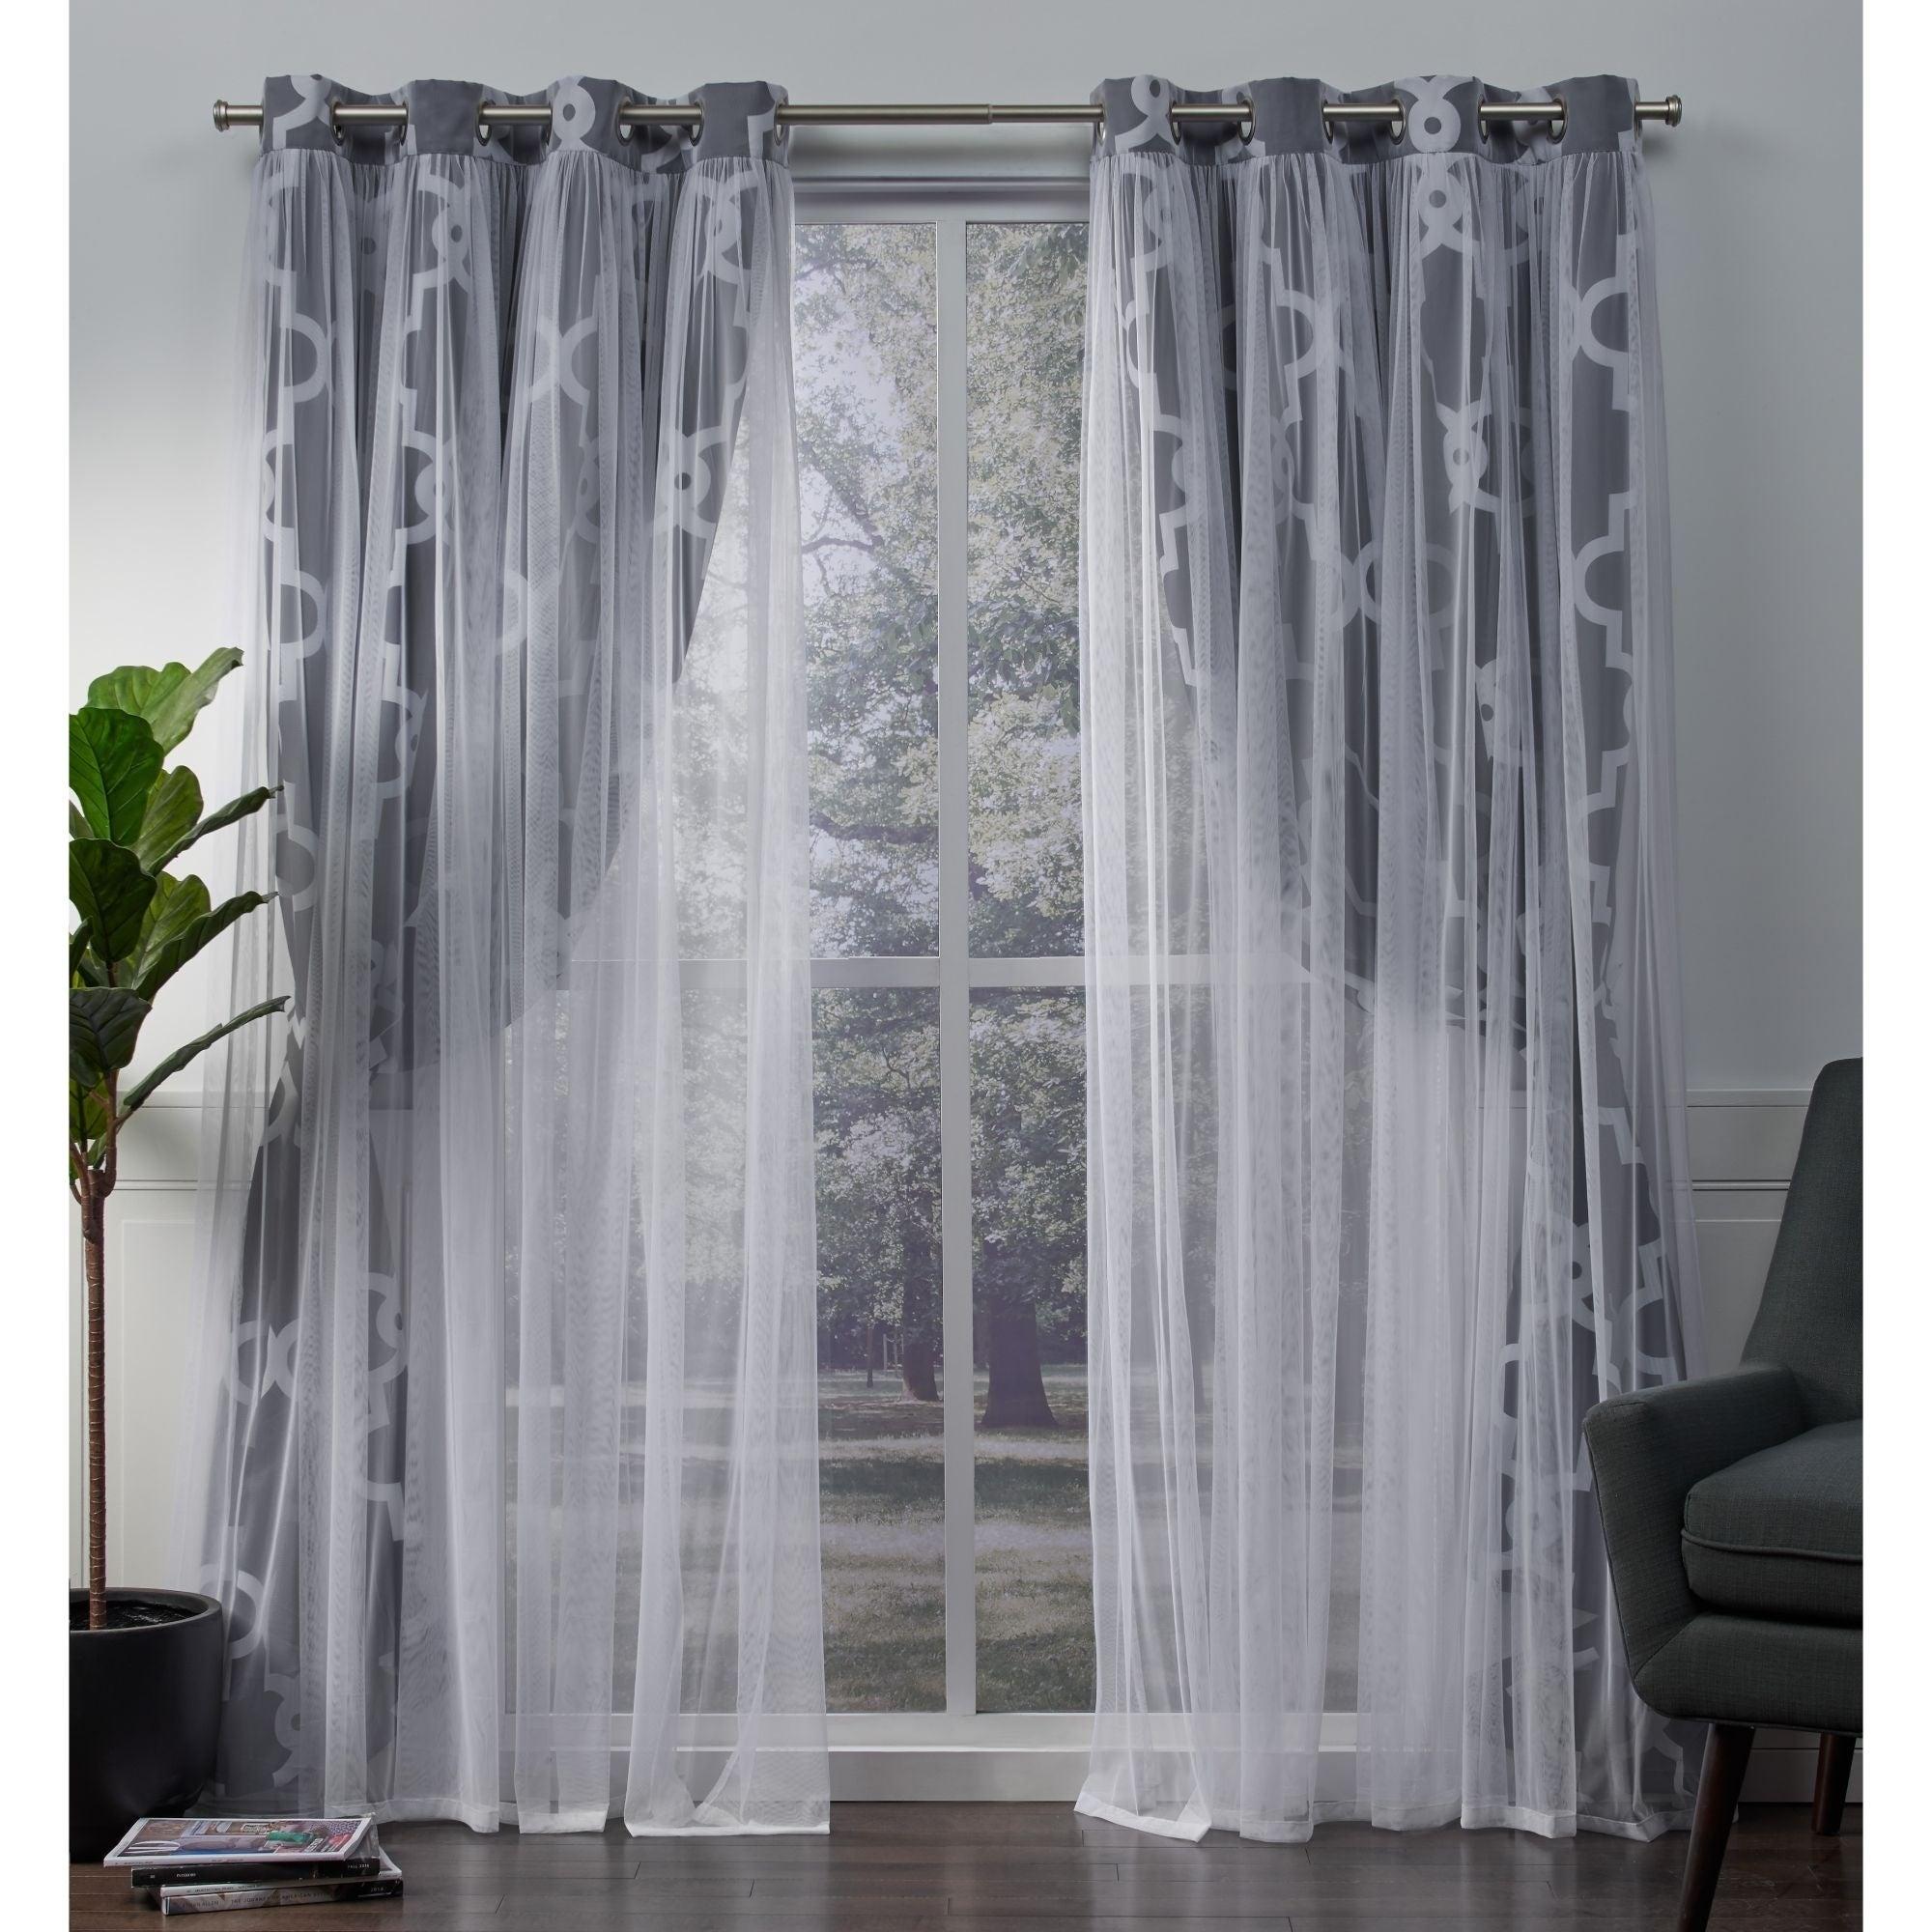 Ati Home Alegra Thermal Woven Blackout Grommet Top Curtain Panel Pair In Woven Blackout Grommet Top Curtain Panel Pairs (View 11 of 30)